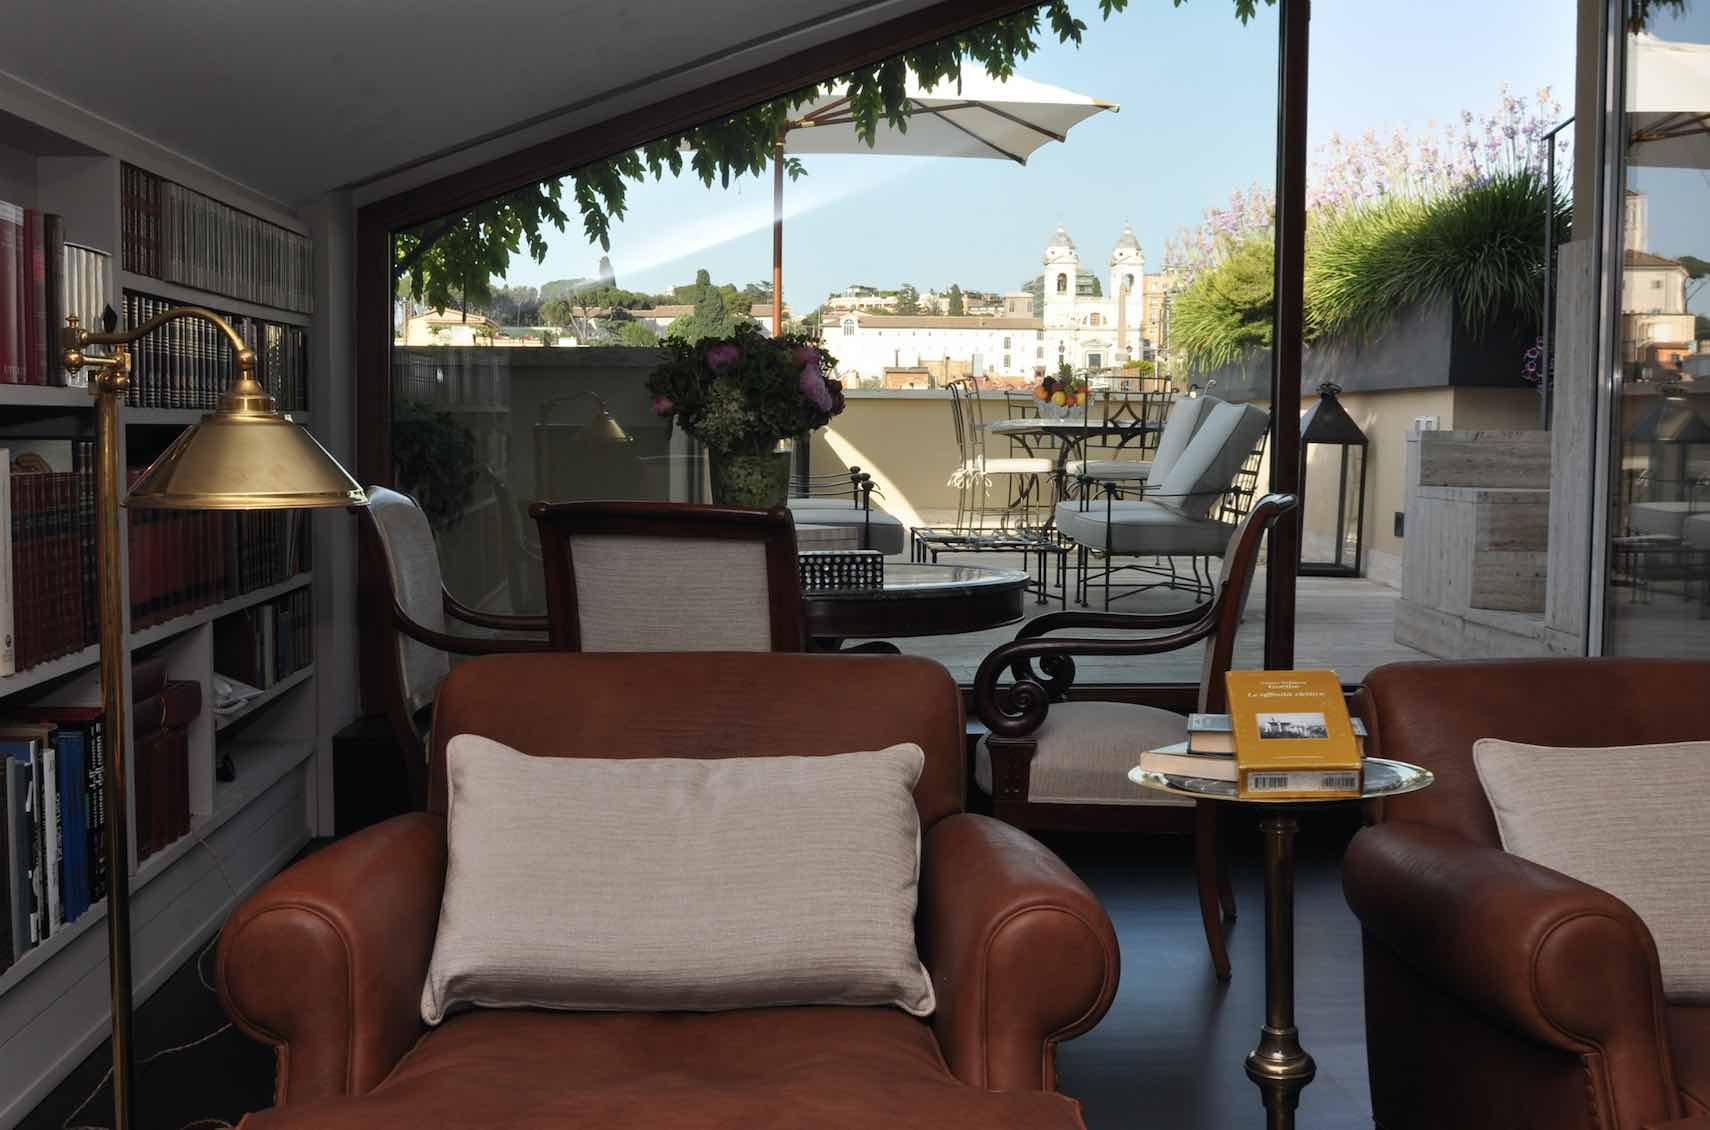 La Scelta di Goethe - Best Hotels Rome View2.jpg